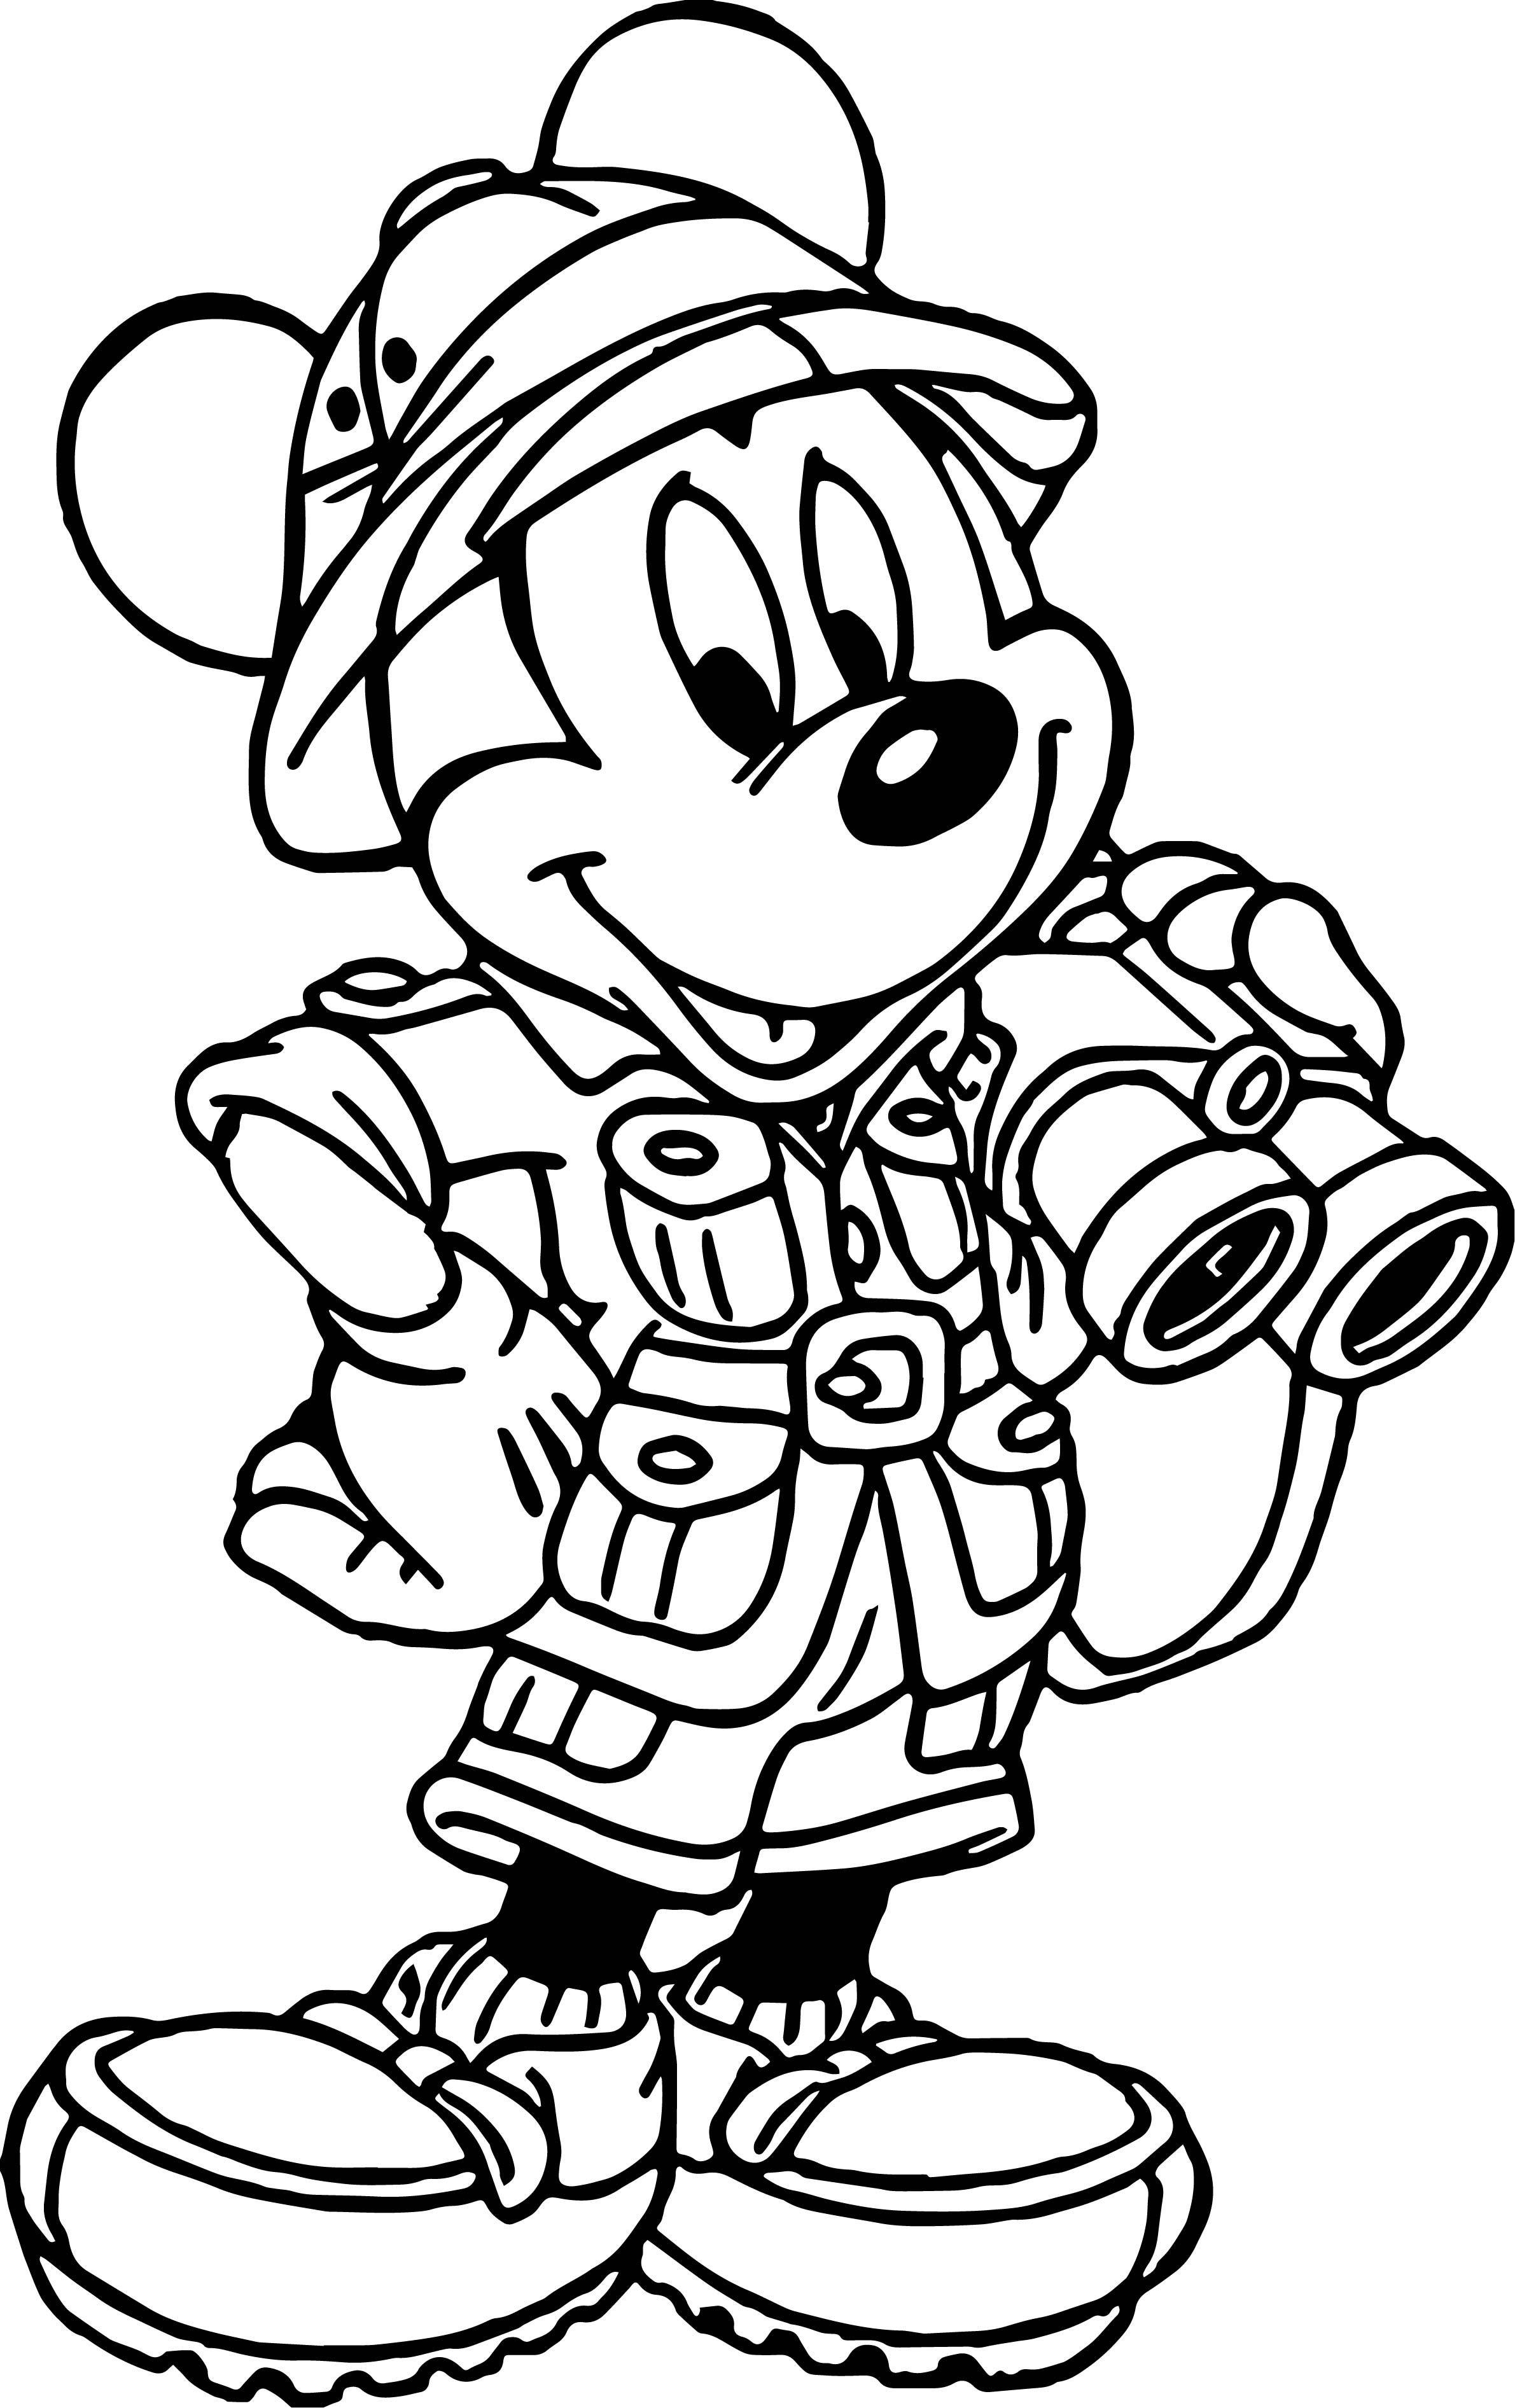 Mickey Mouse Cartoon Animal Kingdom Travel Coloring Page Animal Coloring Pages Mickey Mouse Coloring Pages Animal Kingdom Colouring Book